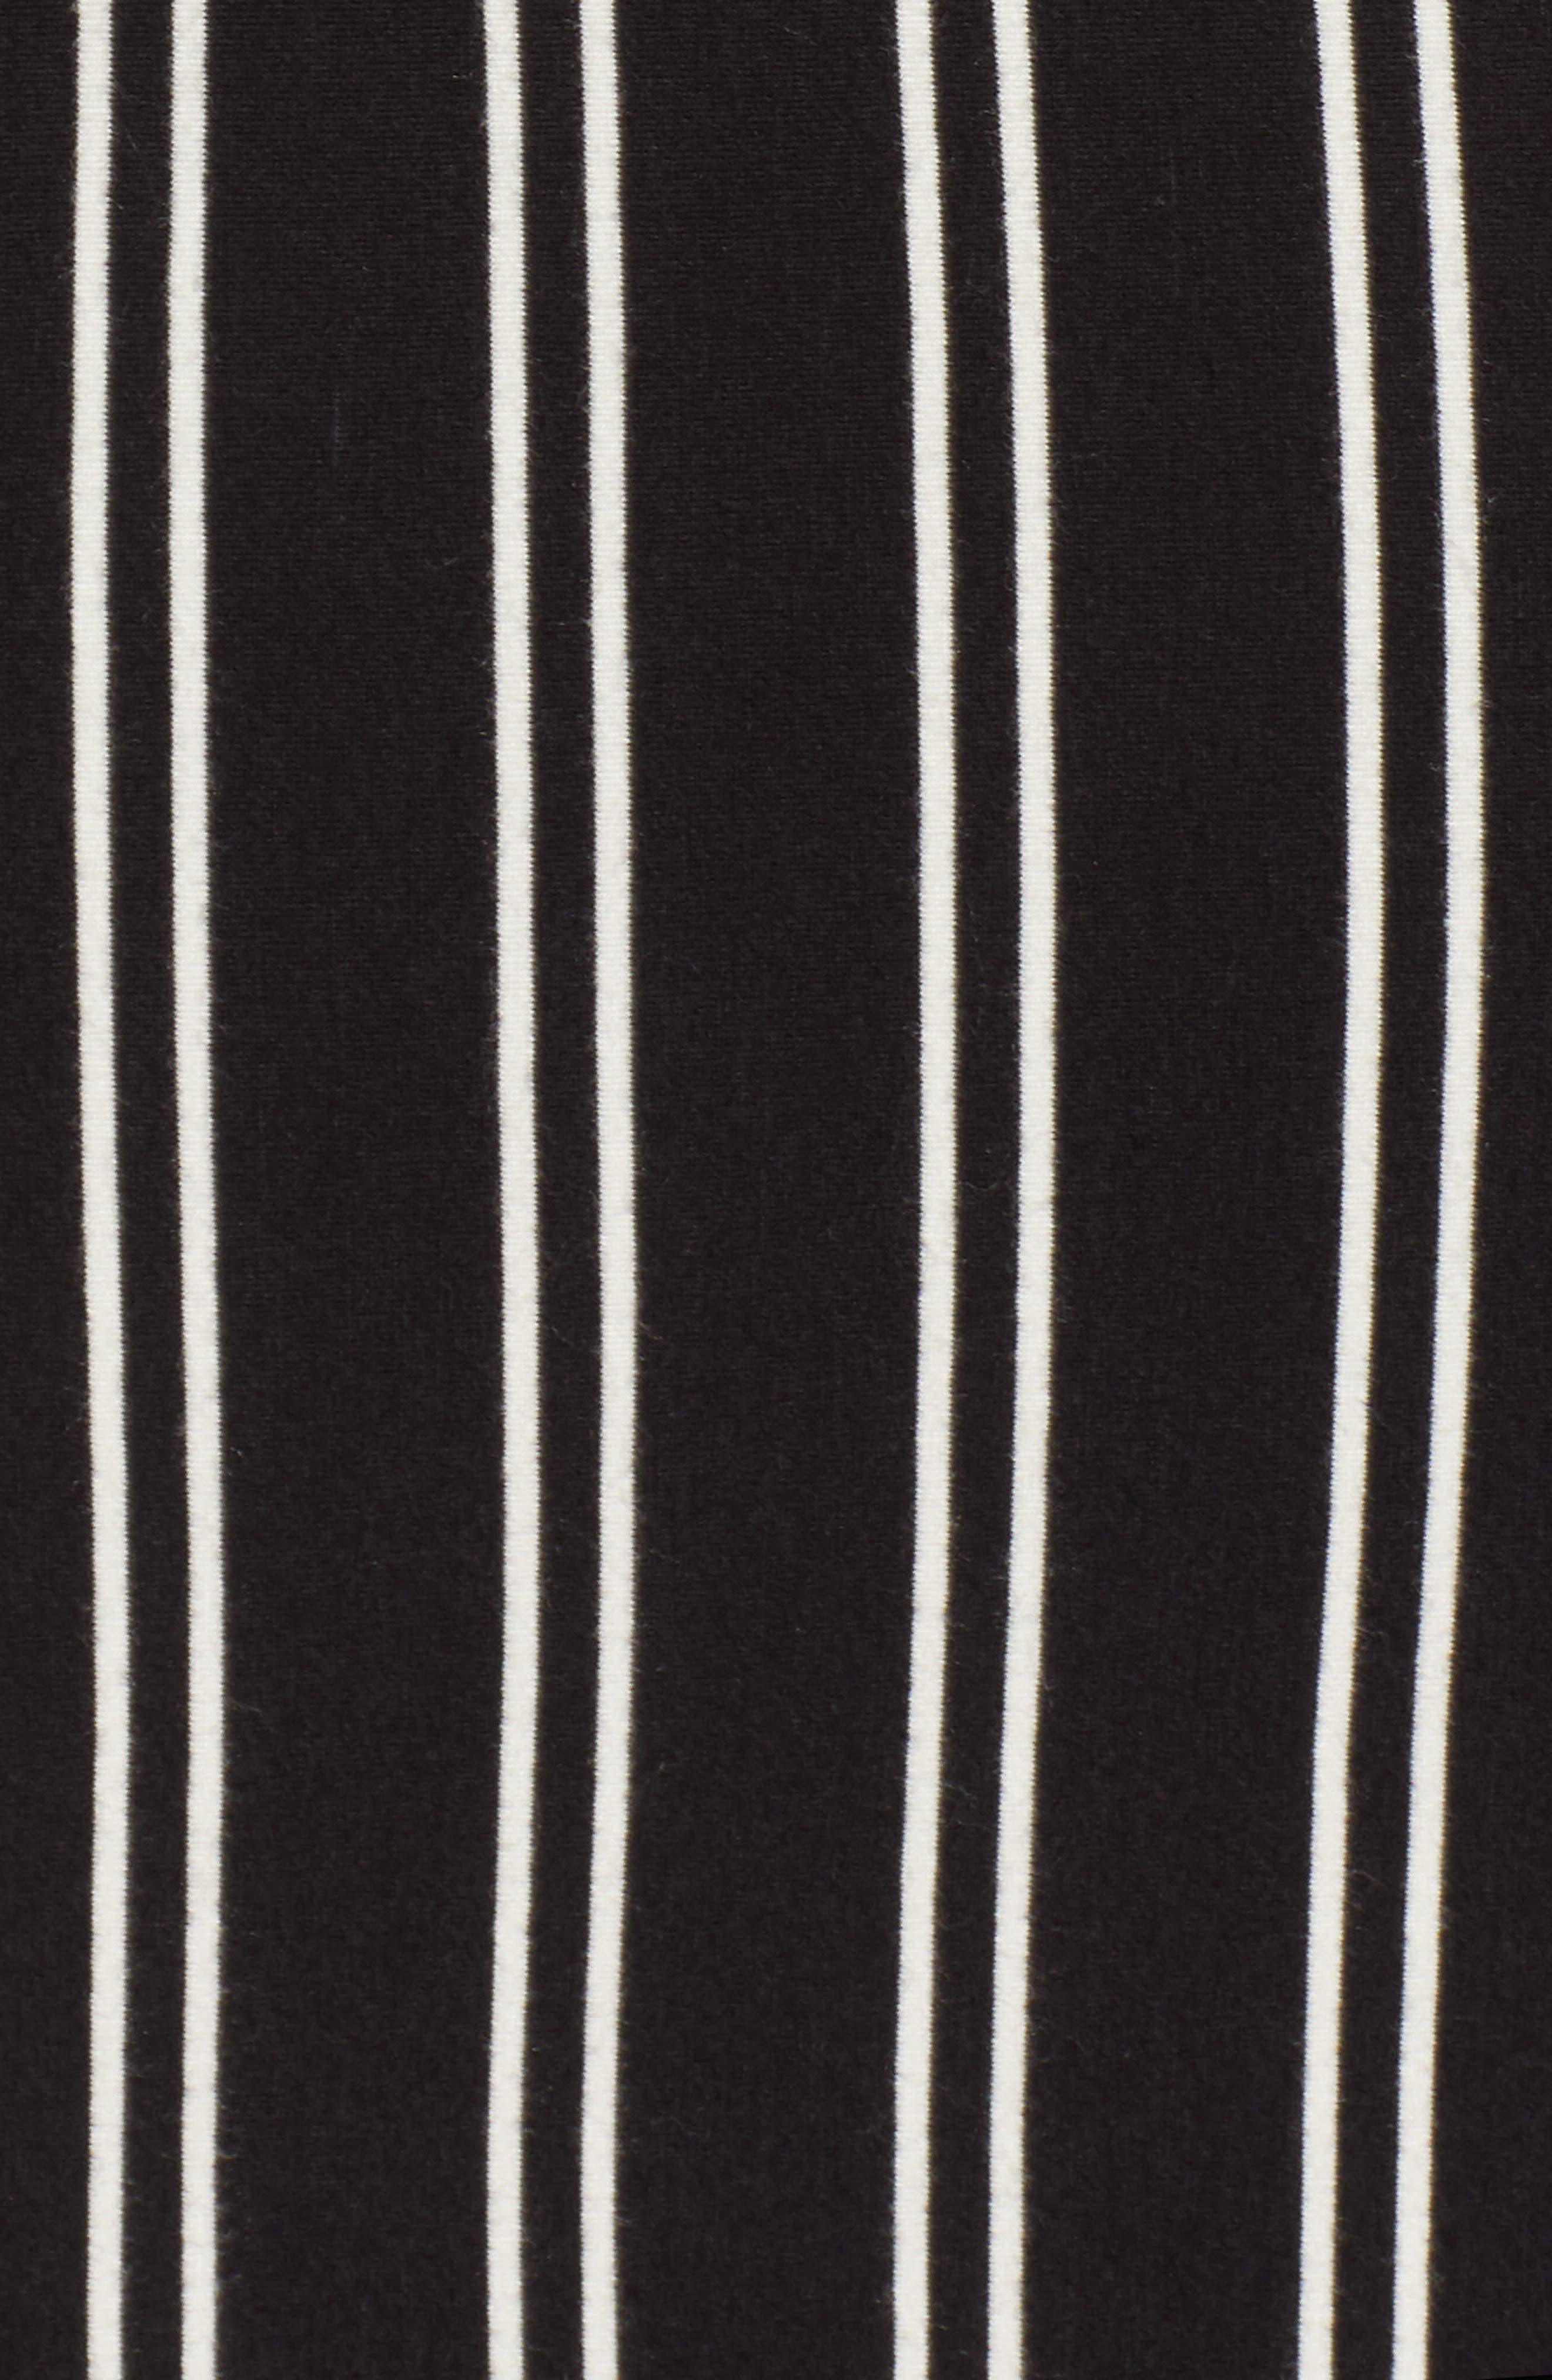 Lockette Strappy Striped Dress,                             Alternate thumbnail 6, color,                             Jet Black Multi